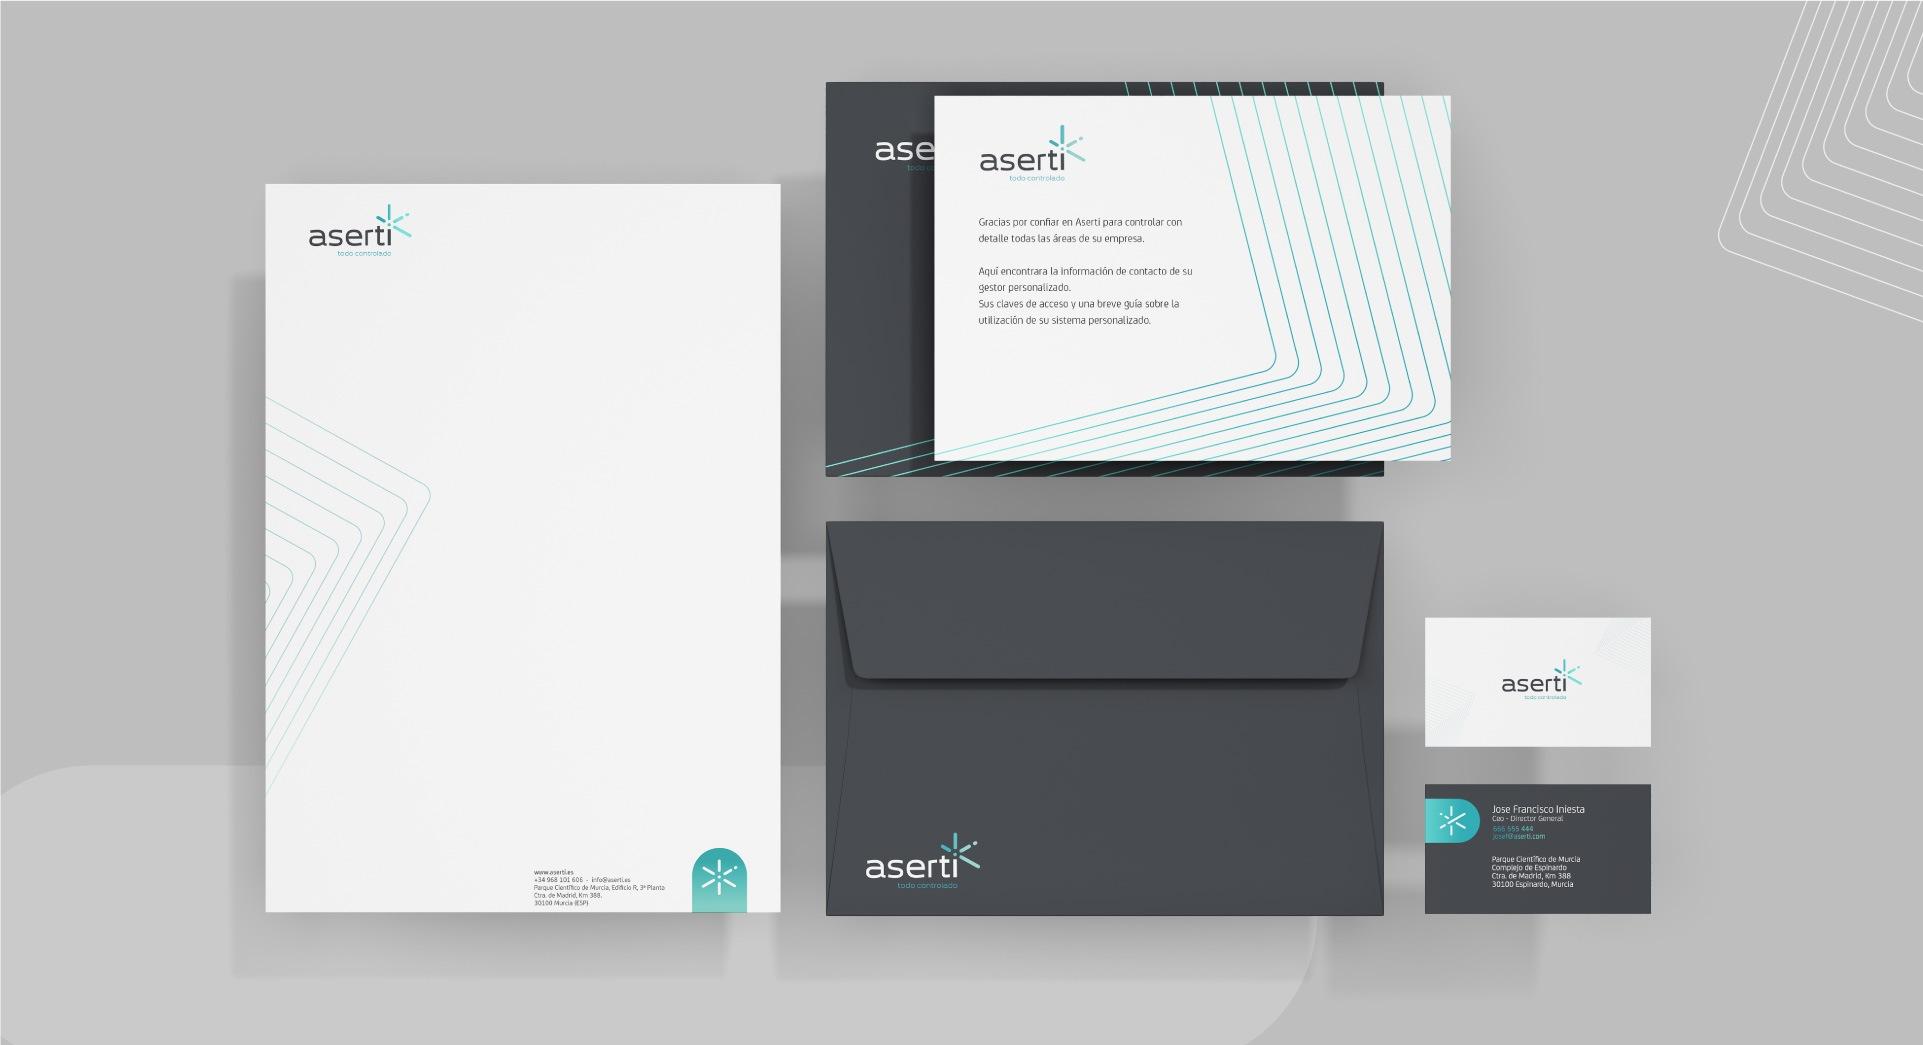 behind identidad marca estrategia diseño Aserti 7